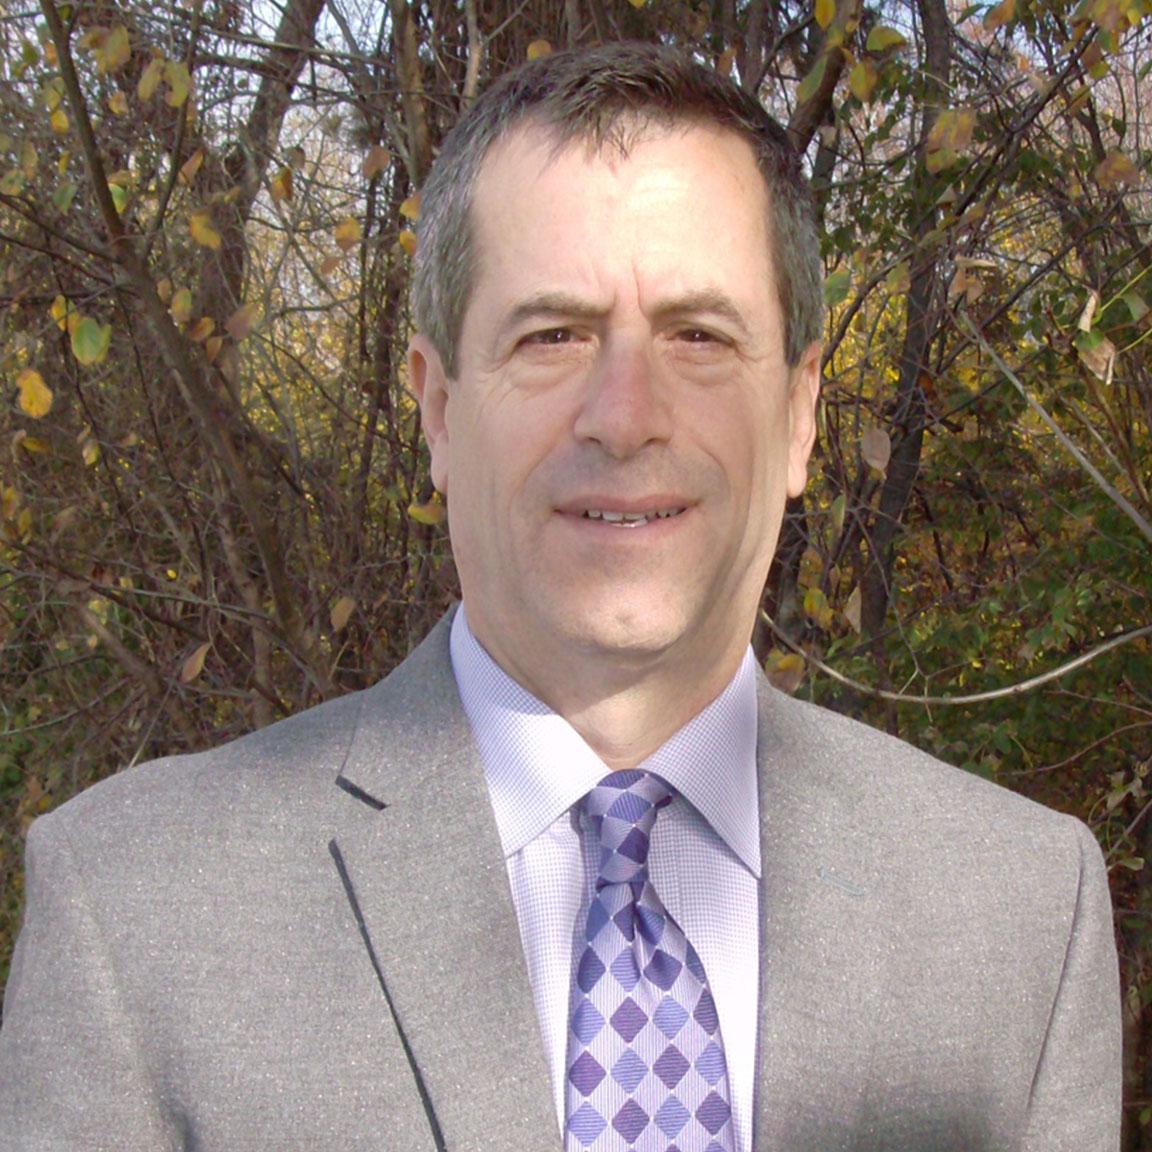 Jeffrey Goldstone